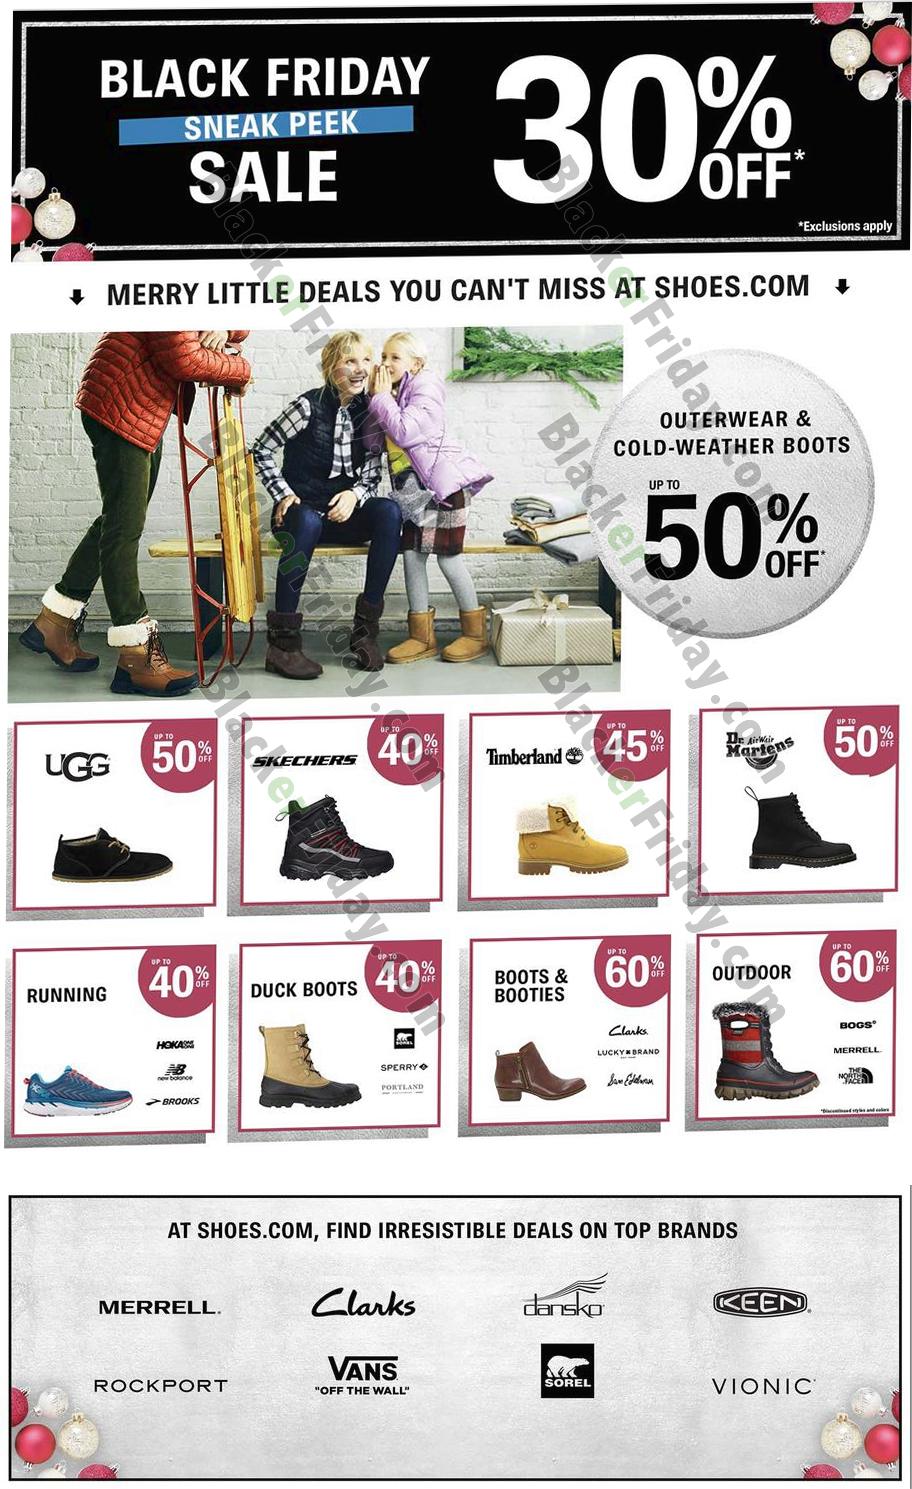 Shoes.com Black Friday 2020 Sale - What